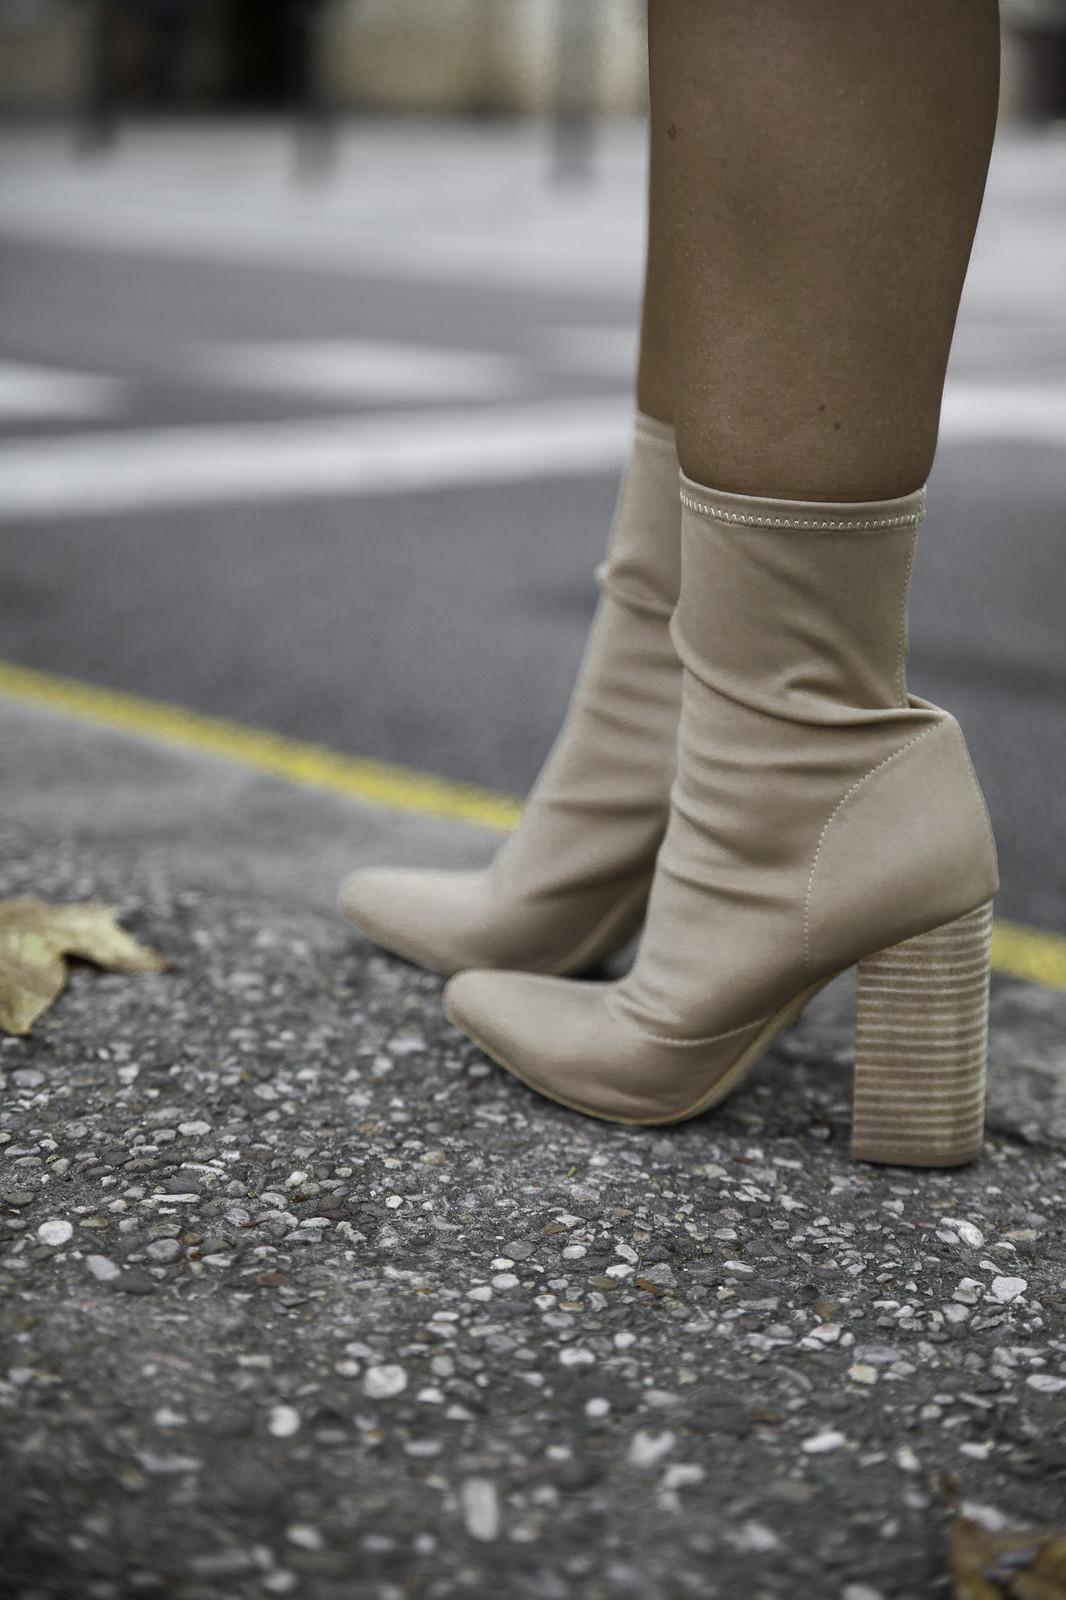 012_Como_combinar_un_cardigan_khaki_etnico_otoño_theguestgirl_rüga_laura_santolaira_influencer_embarazada_fashion_street_style_barcelona